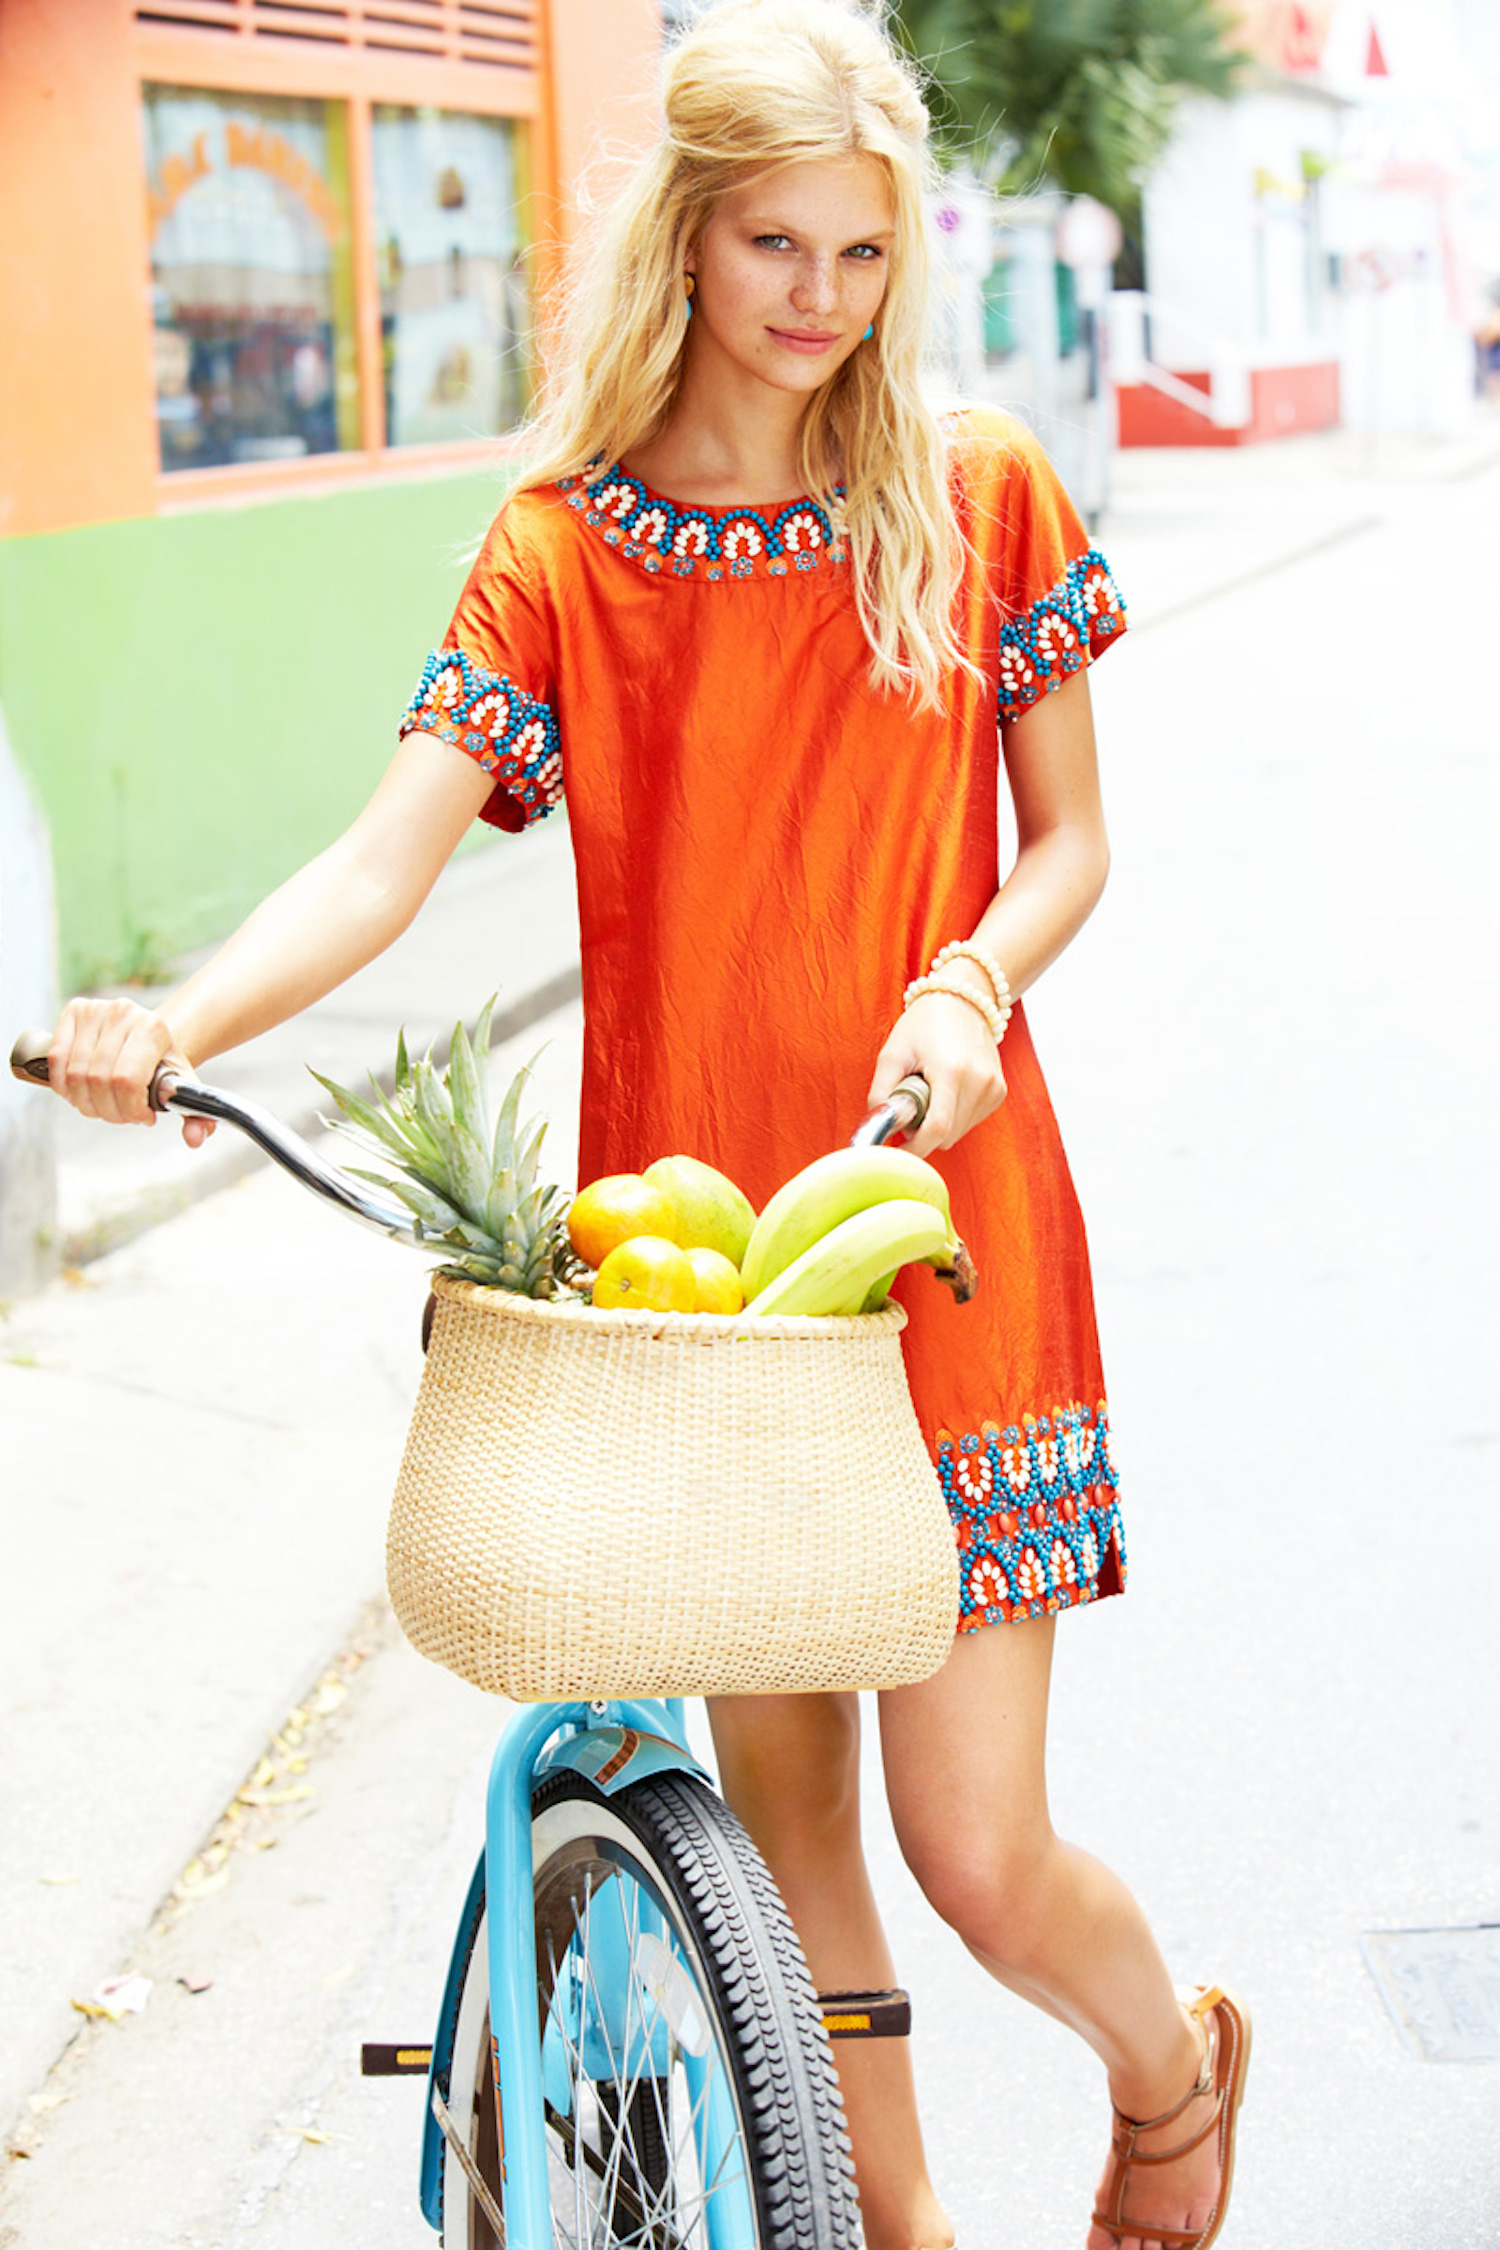 on a bike calypso st barth in barbados with nadine leopold and matt jones